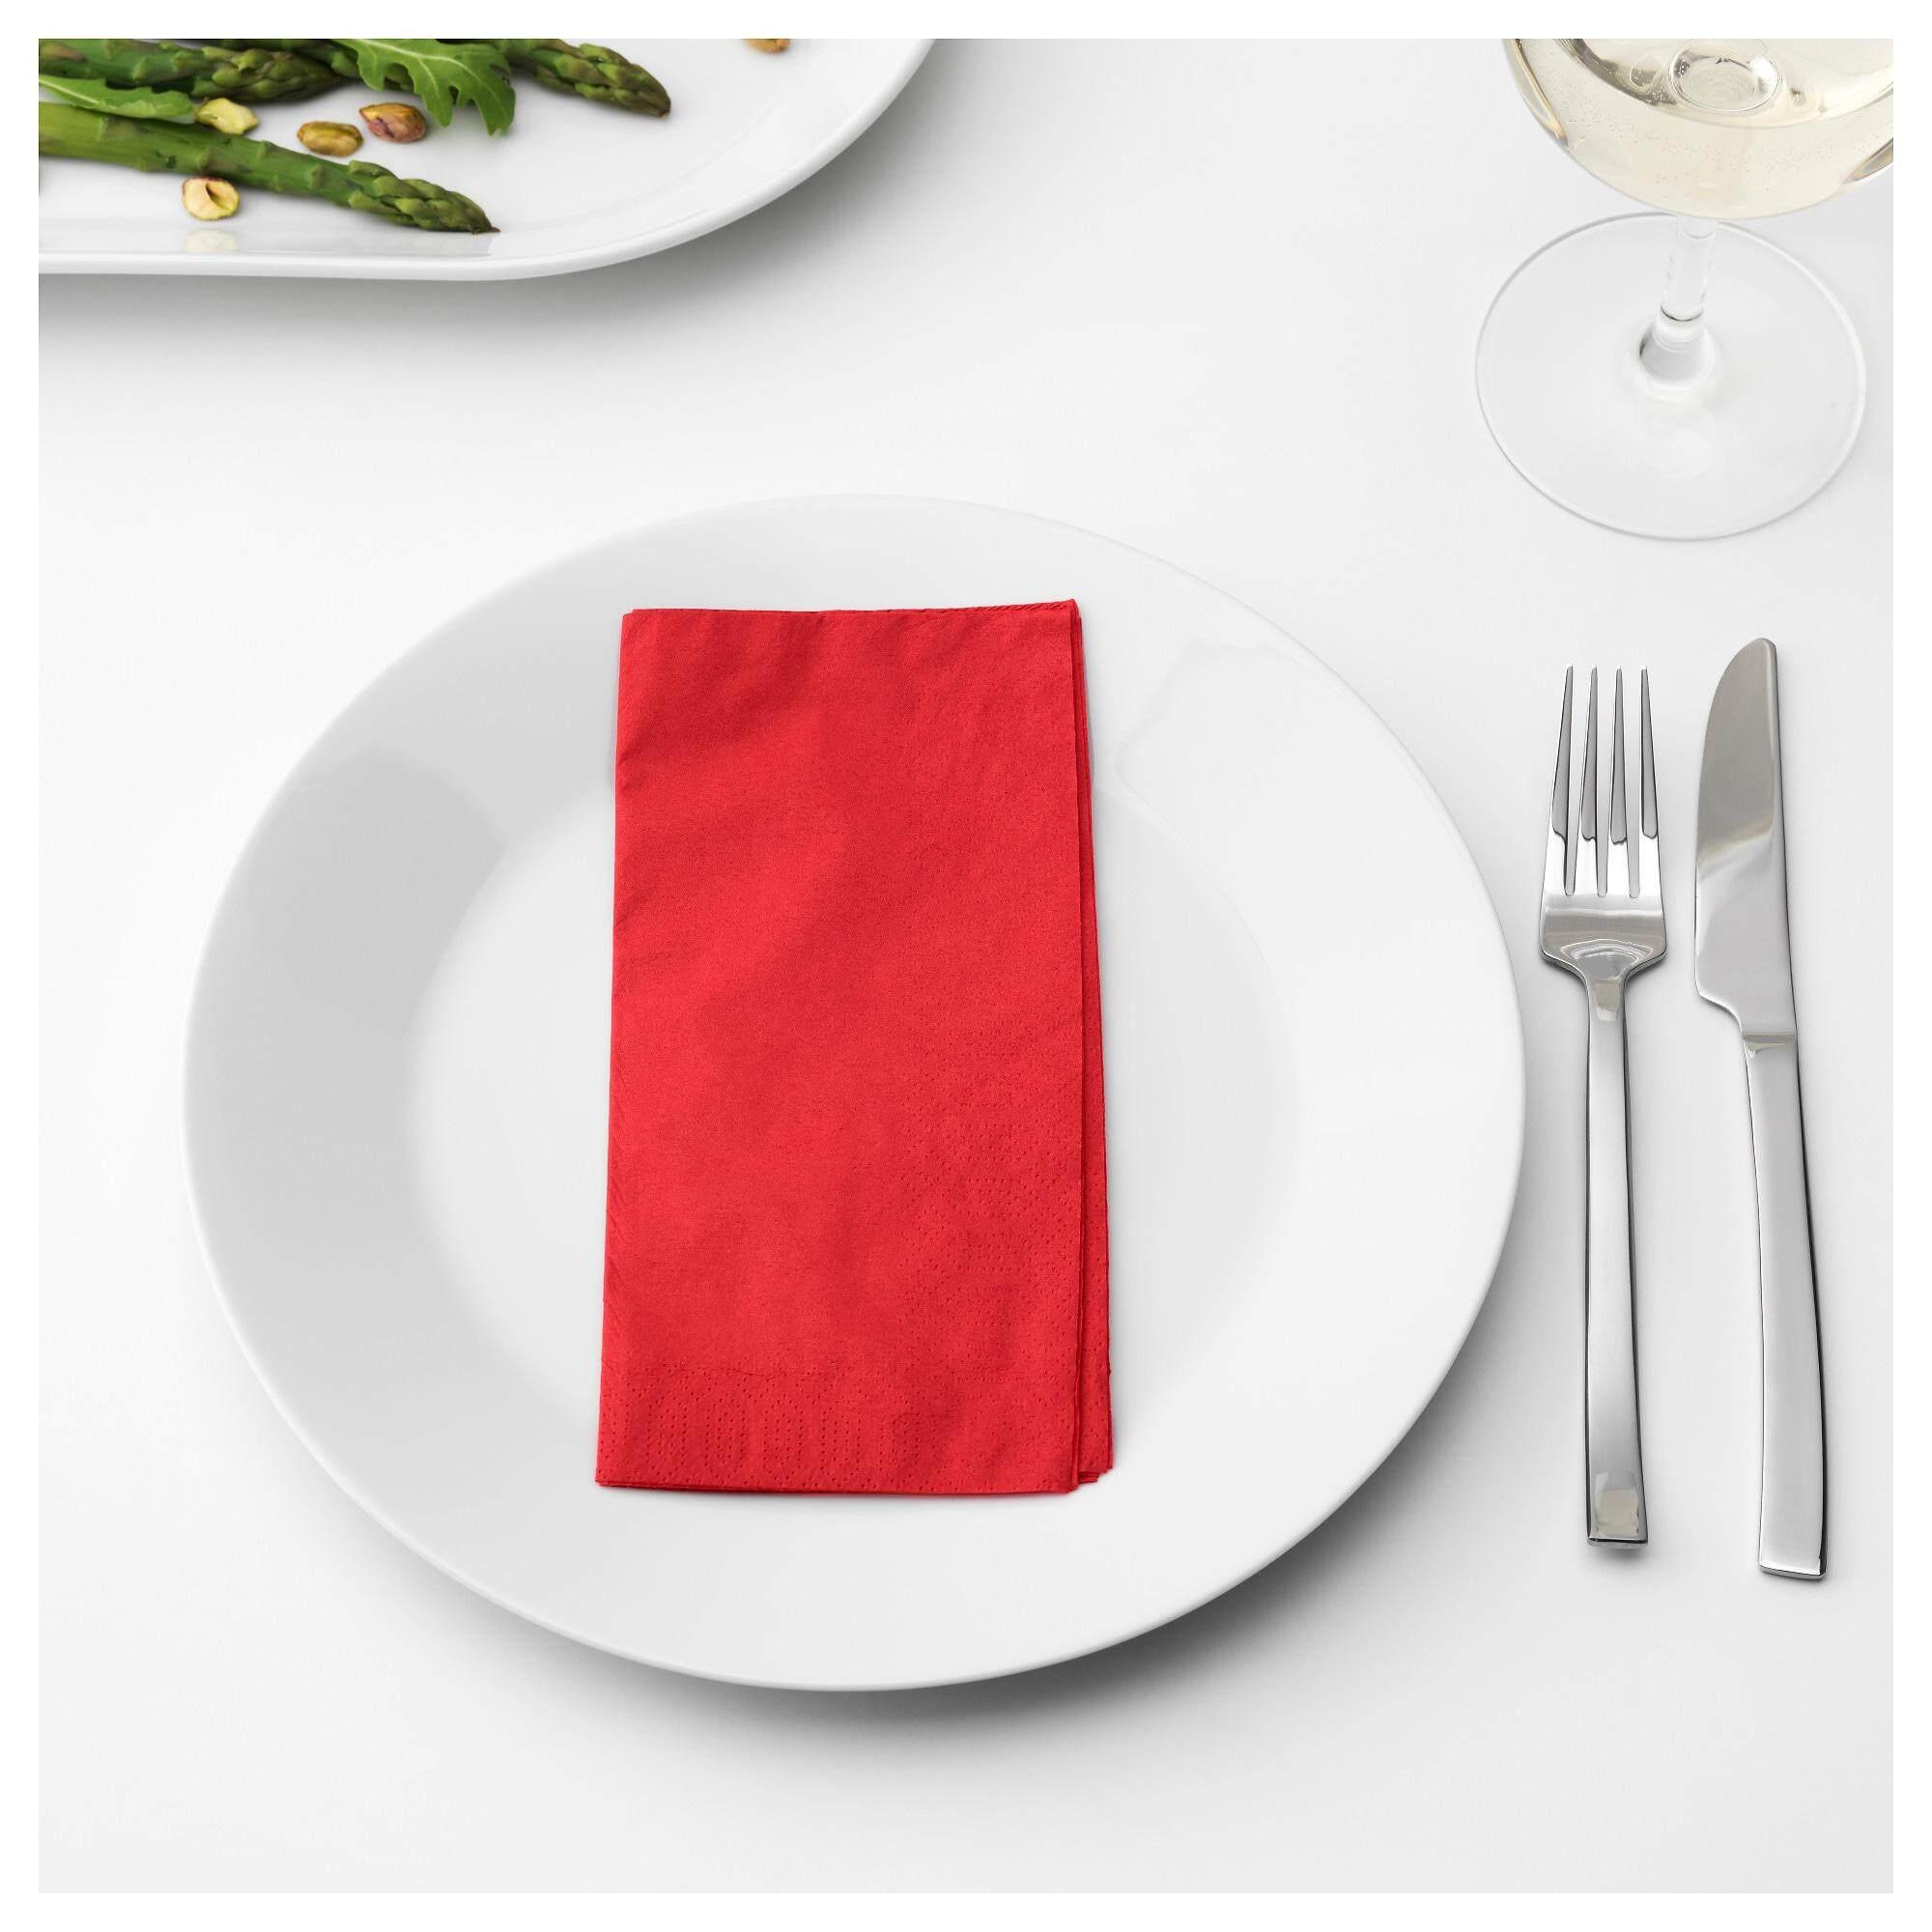 Fantastisk ฟันทัสติสค์ กระดาษเช็ดปาก แดง กระดาษเช็ดปากหนา 3 ชั้น จาก Ikea By Super Ikea.